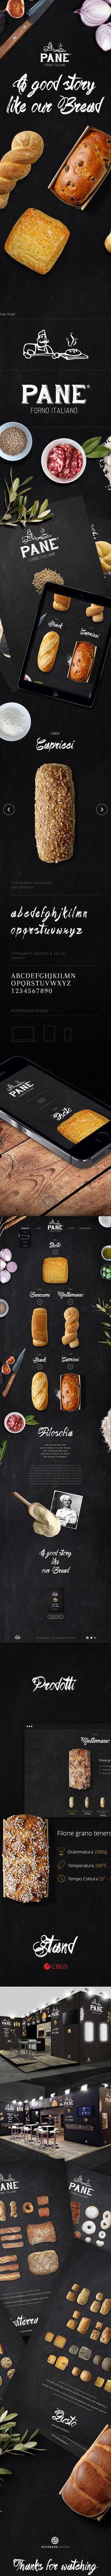 Pane | Forno Italiano on Branding Served